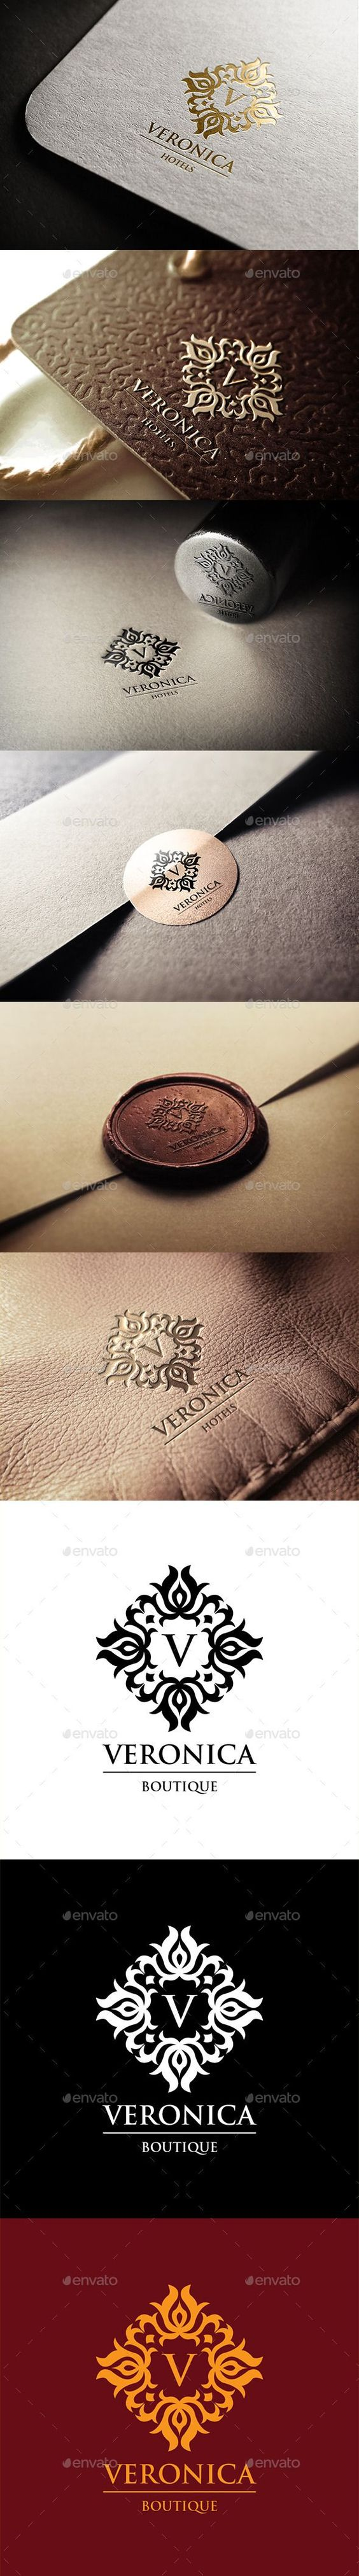 Veronica Hotels Logo - Crests Logo Templates